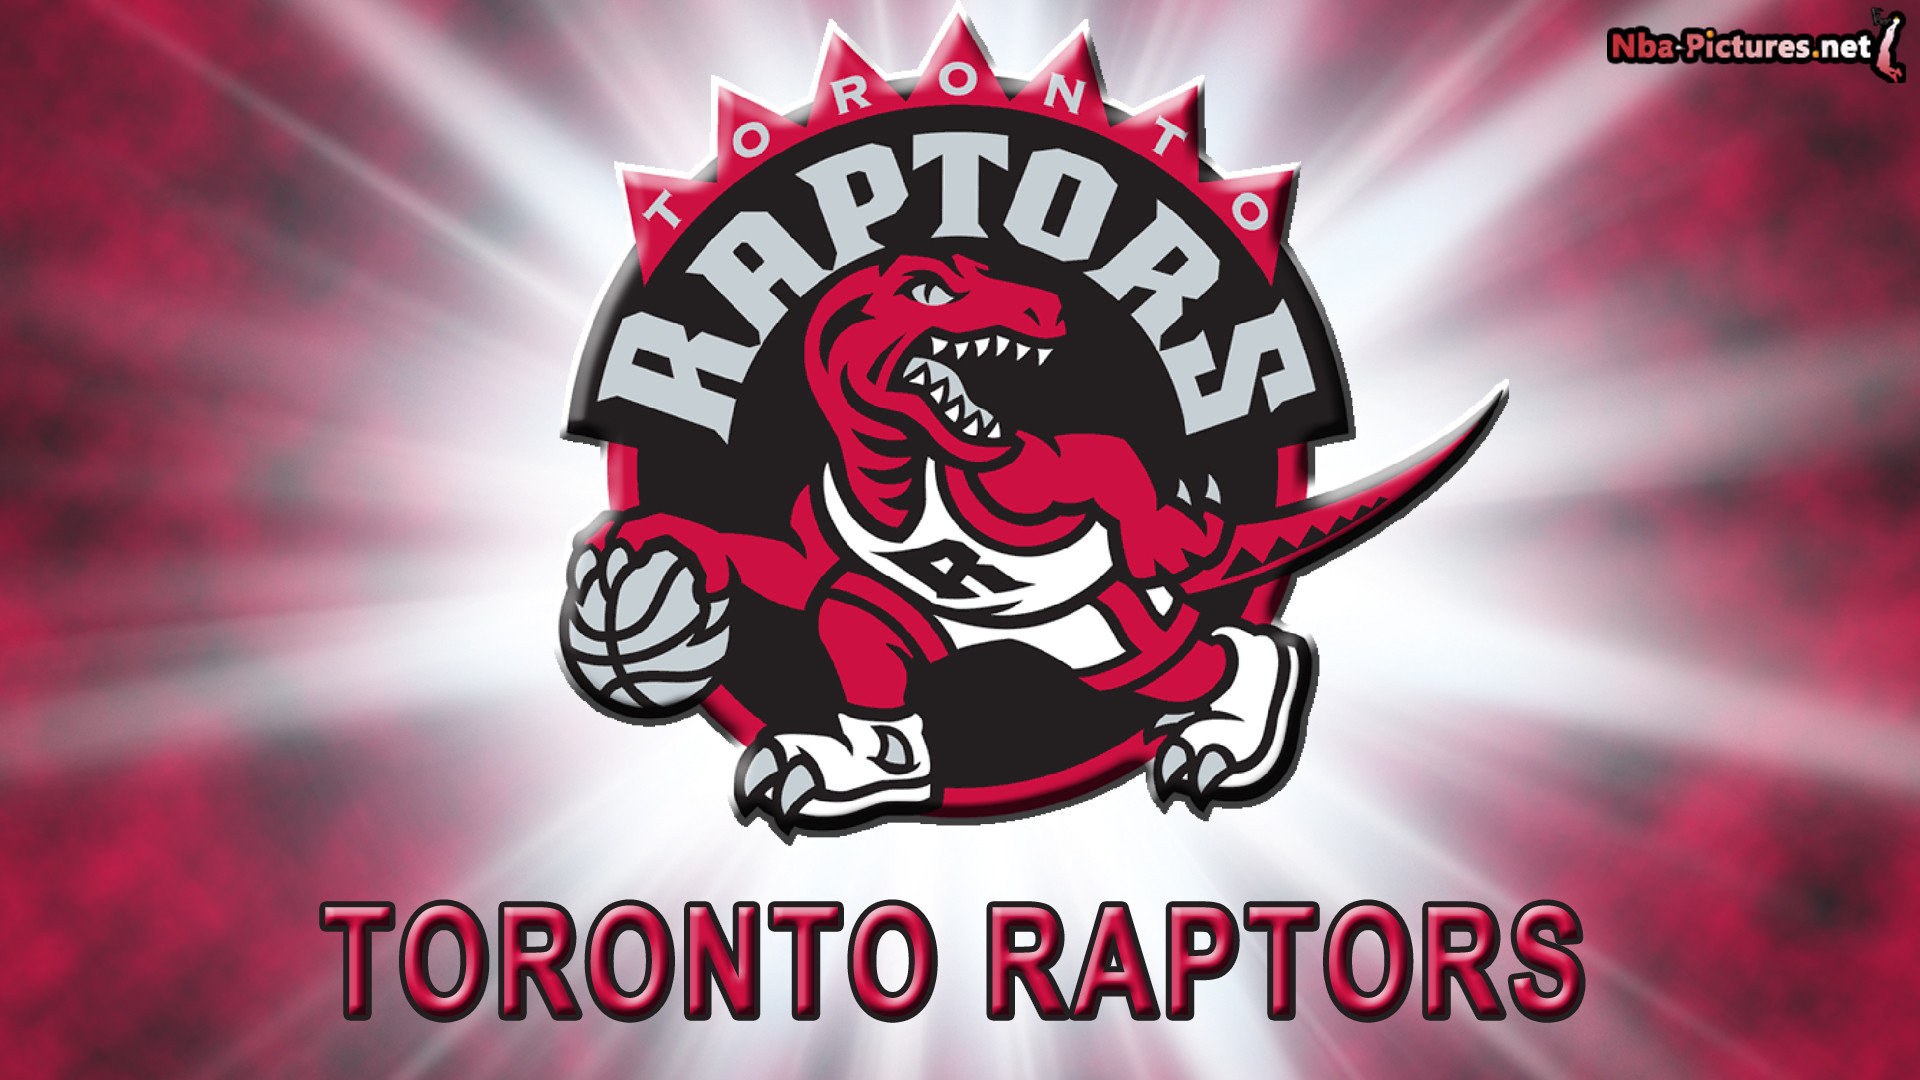 Should The Toronto Raptors Consider A Name Change?